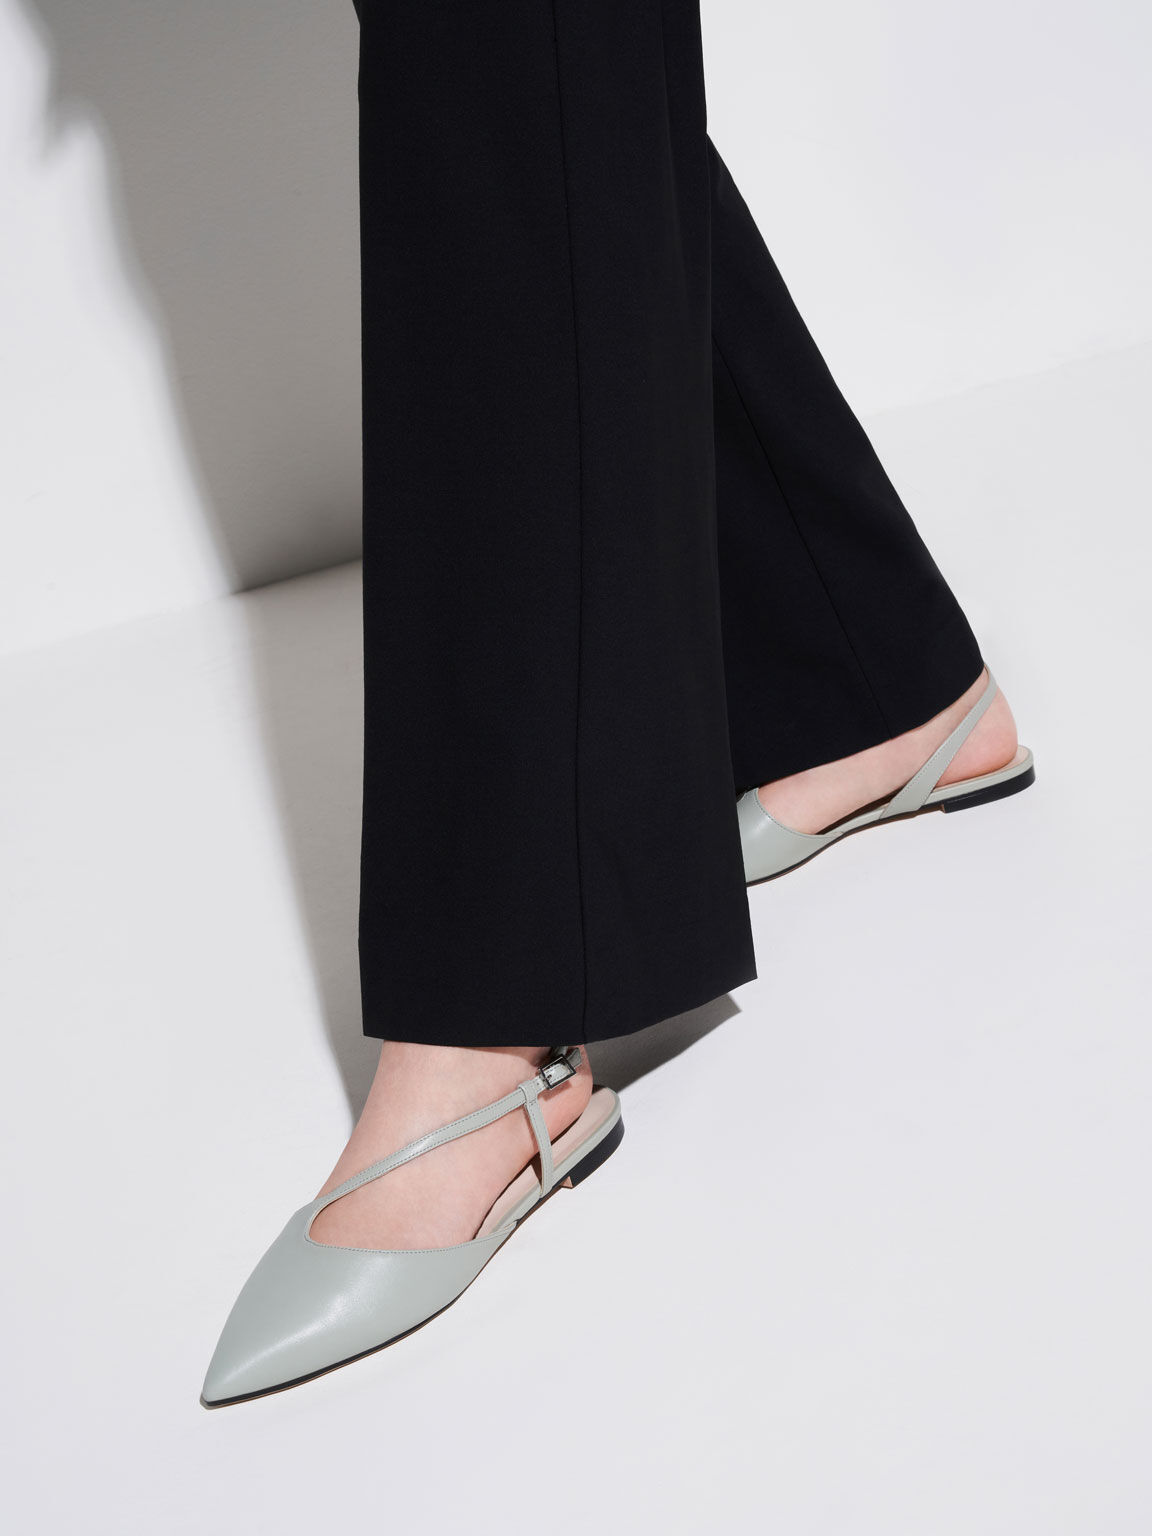 Pointed Toe Asymmetric Strap Ballerina Flats, Mint Green, hi-res